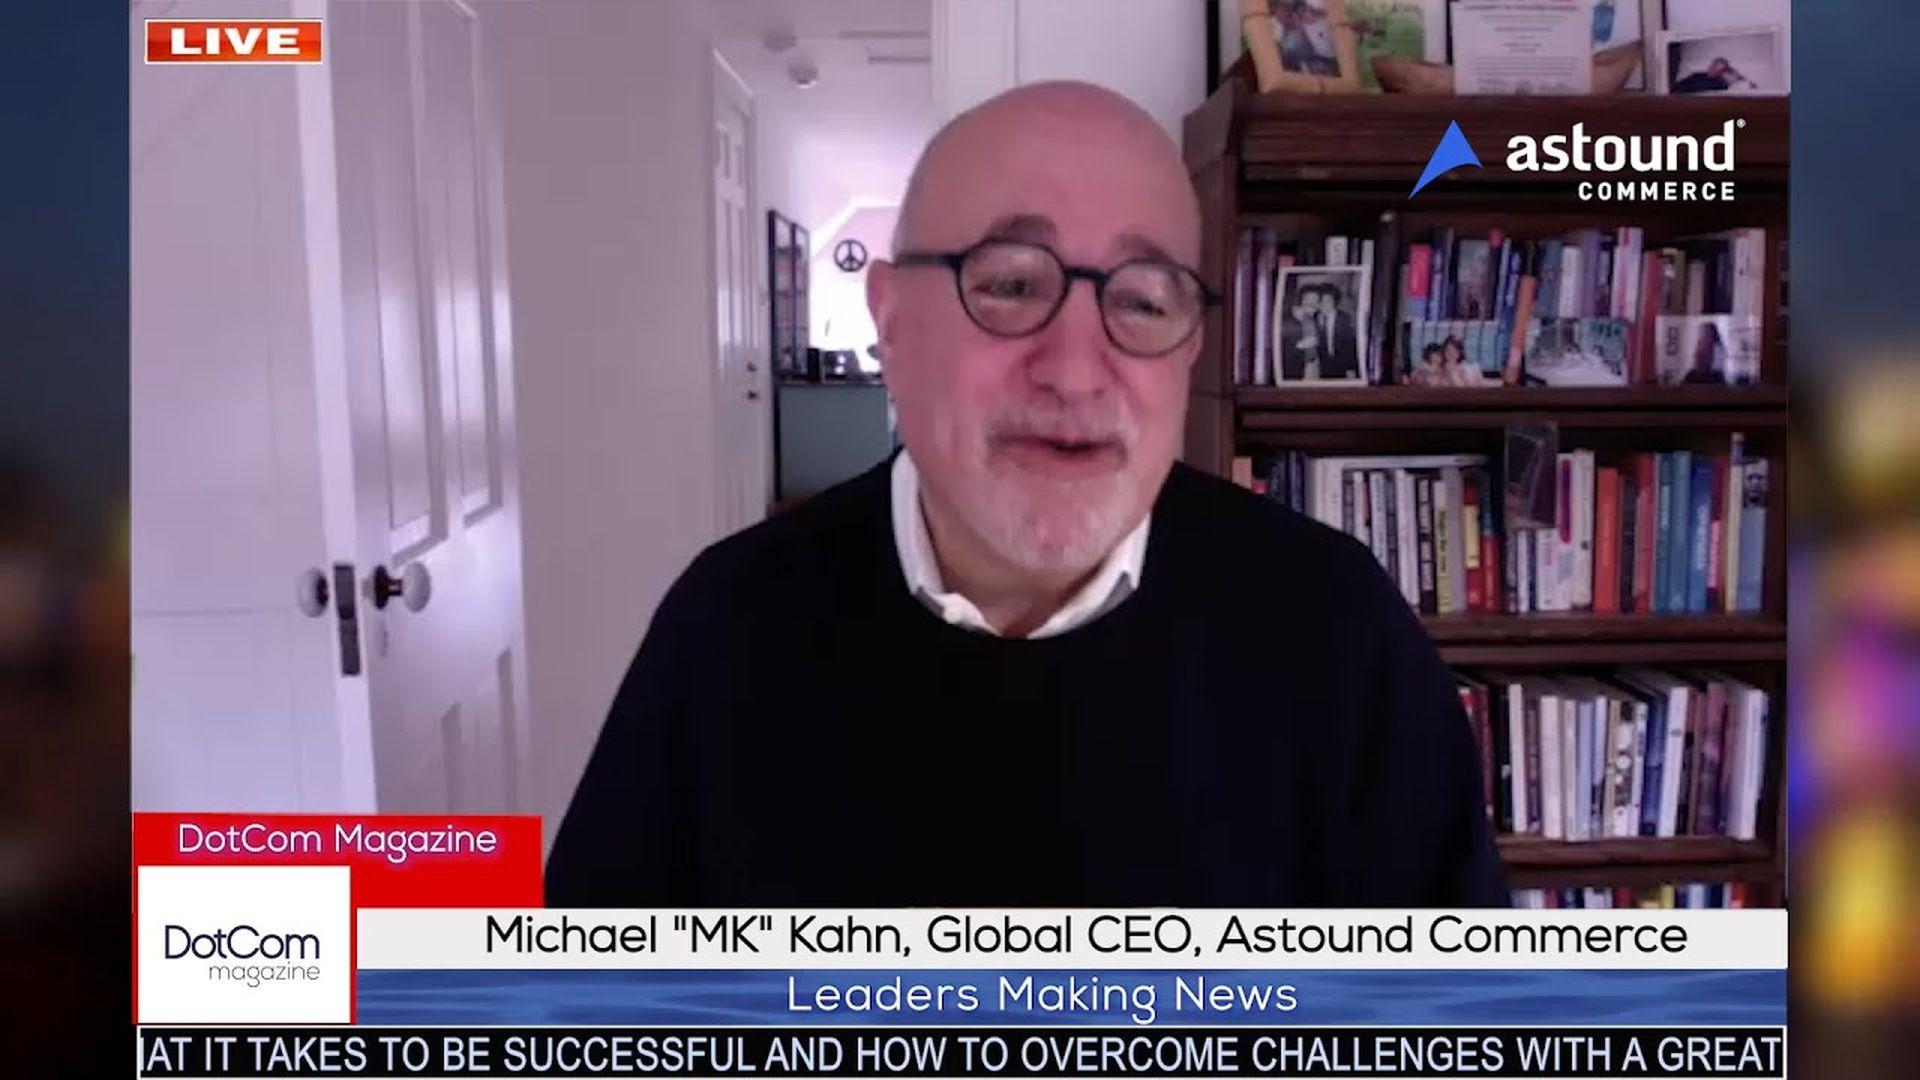 Michael Kahn , Global CEO, Astound Commerce, A DotCom Magazine Exclusive Interview